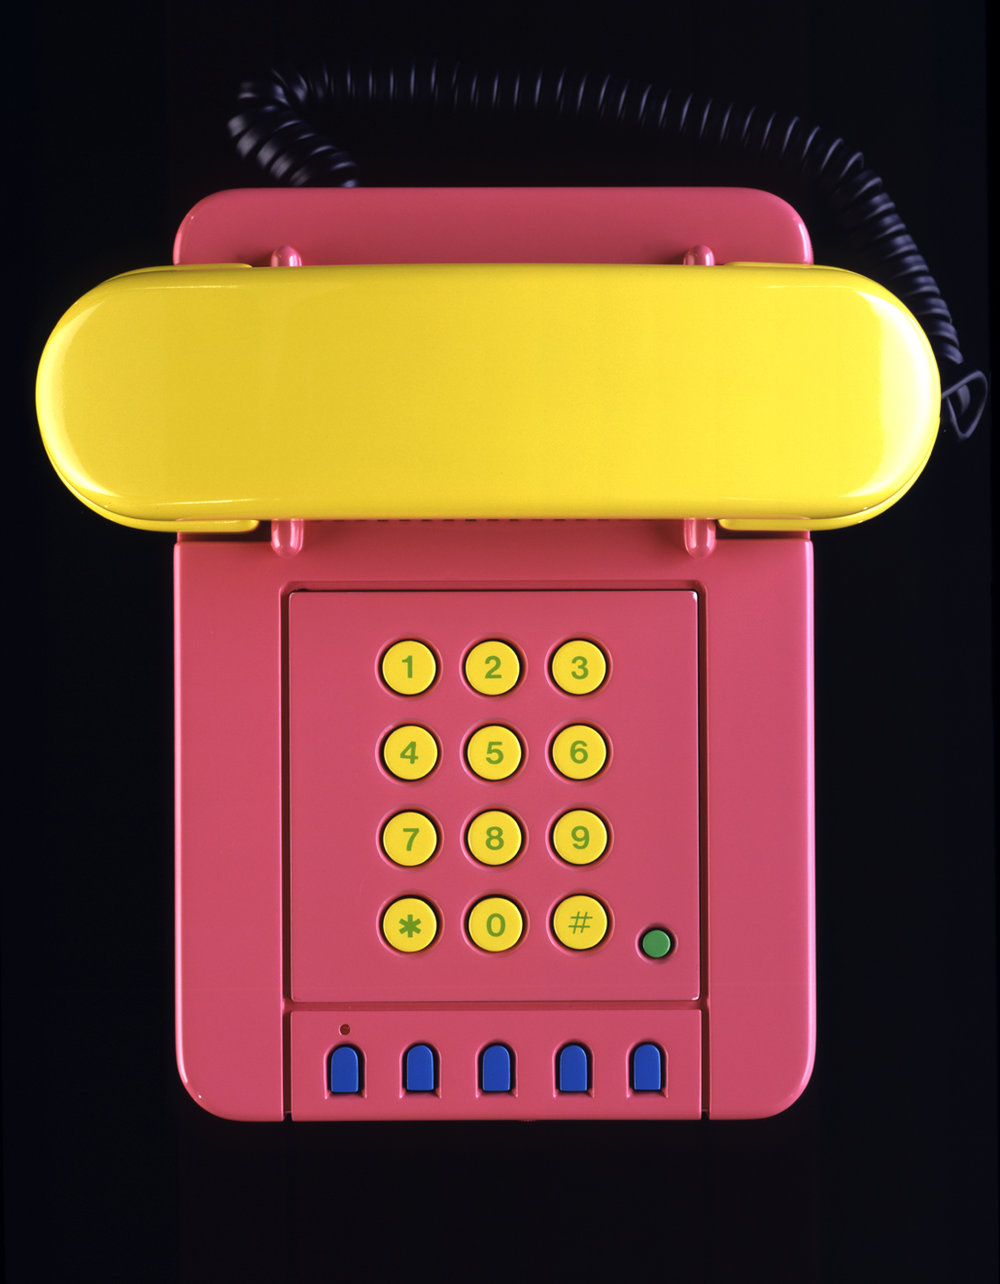 1988_Olivetti_Miram_front_pink.jpg